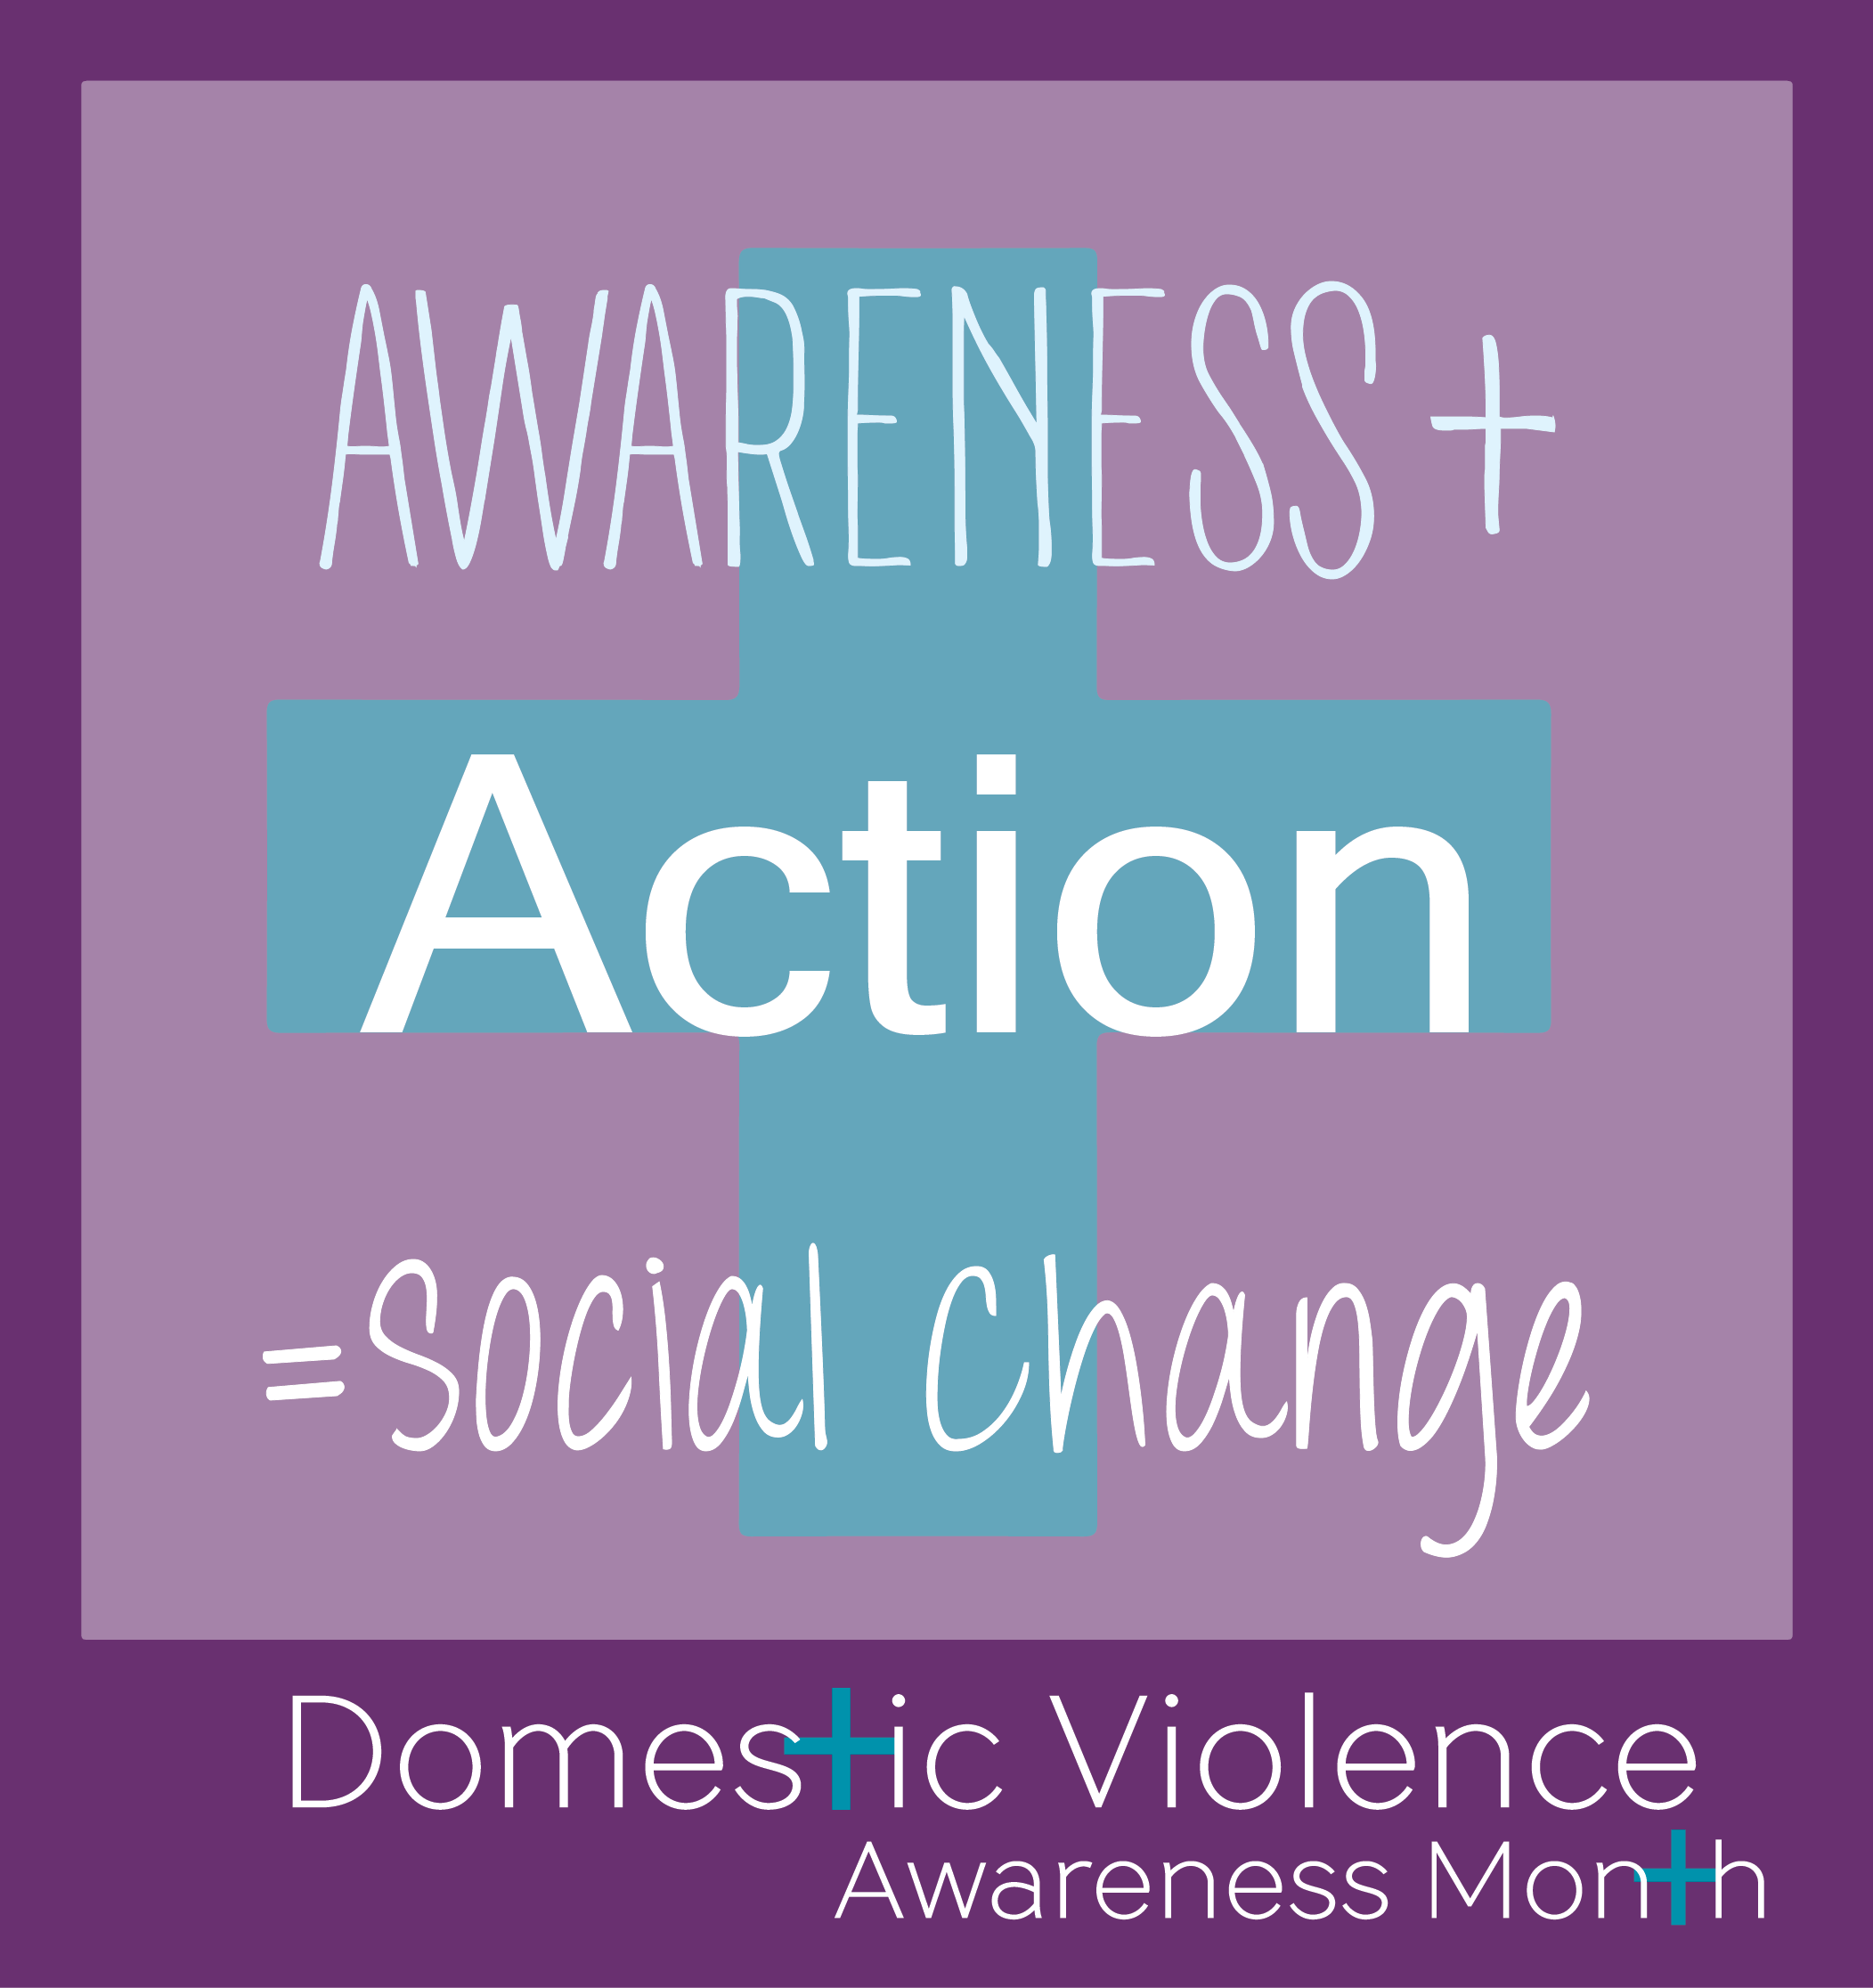 Awareness_Action_Social_Change.png